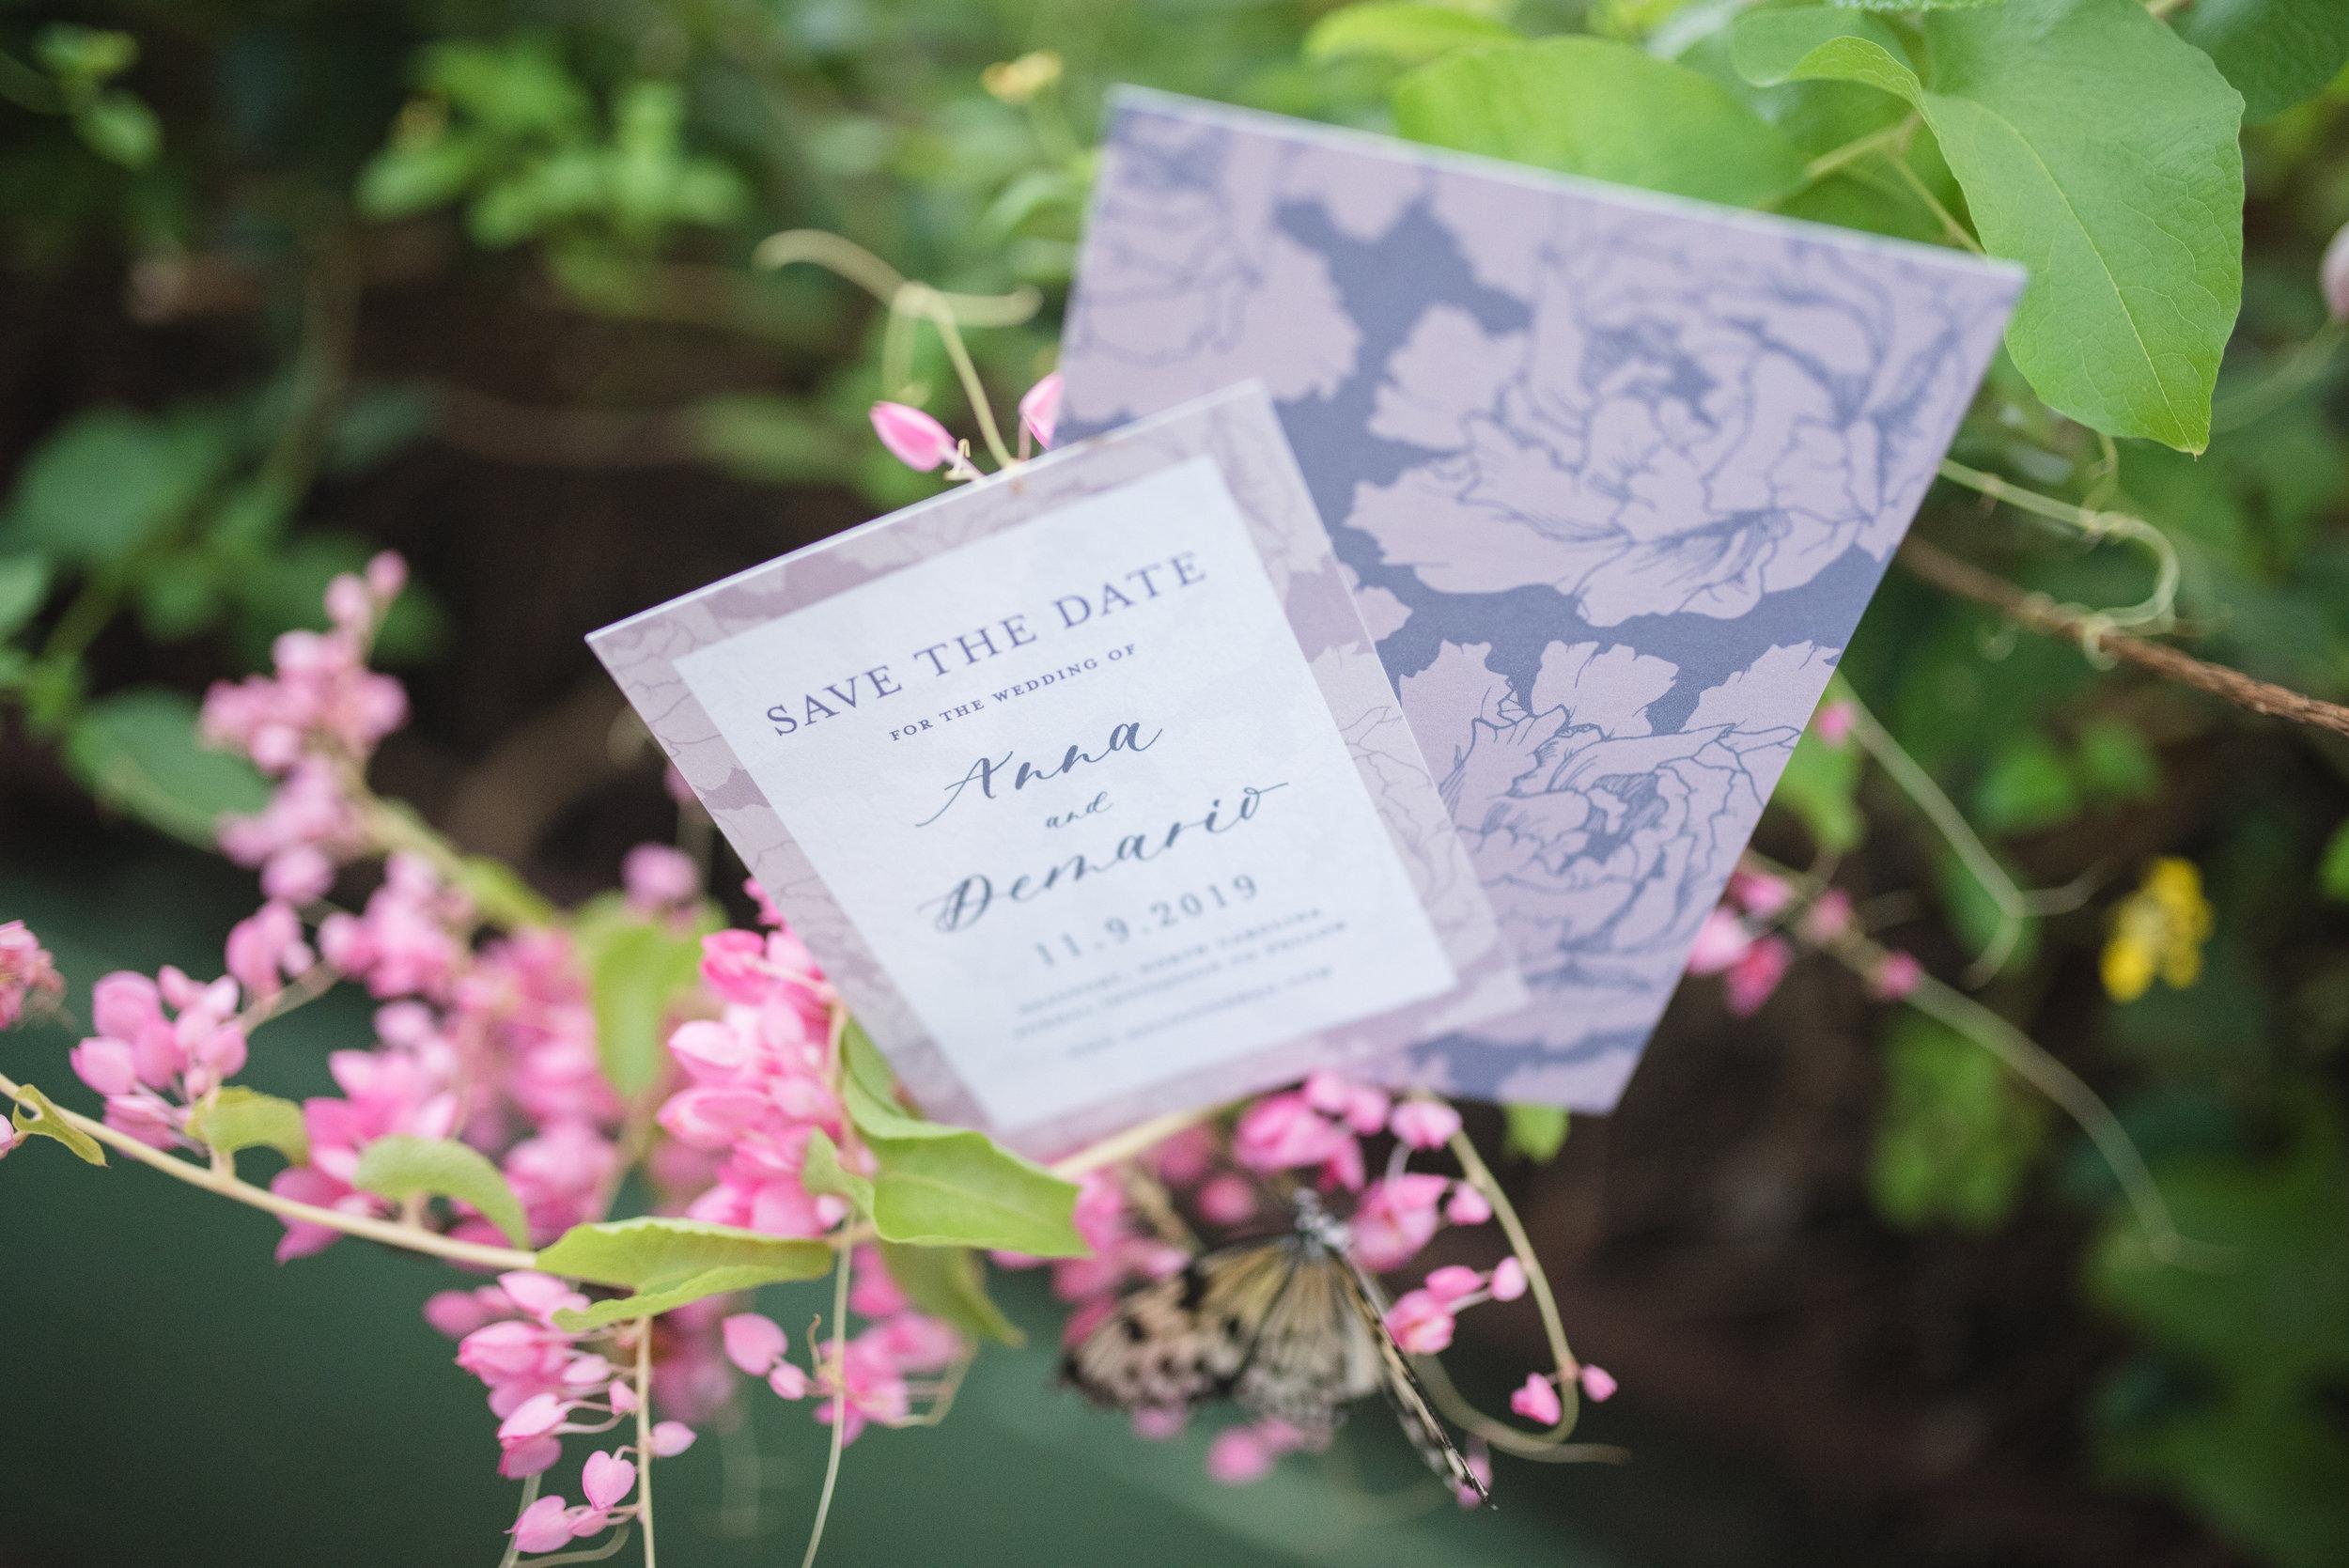 Anna Hand Drawn Wedding Invitation Pink Peonies Feathered Heart PrintsButterfly Garden (146 of 187).jpg